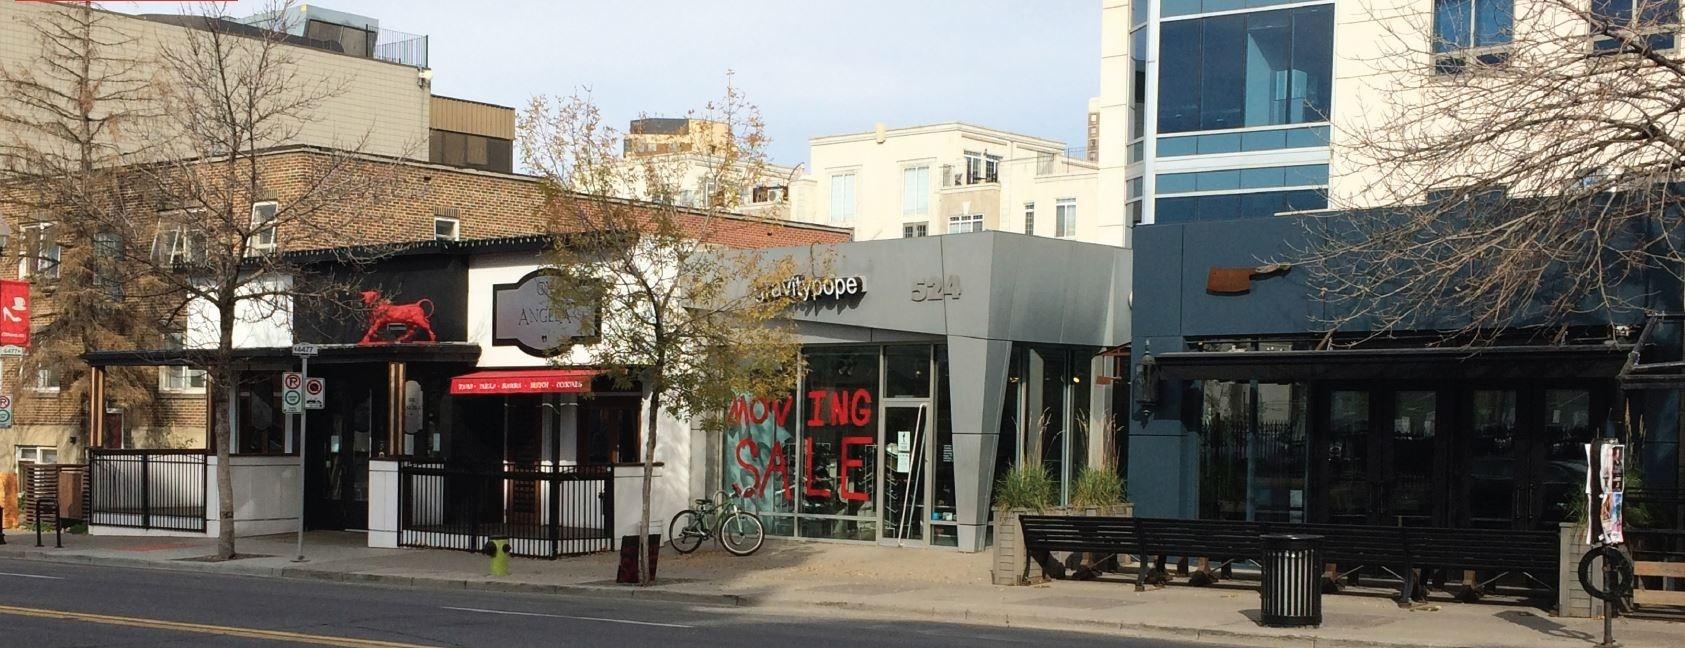 524 avenue 17th Sud-Ouest, Calgary, Alberta